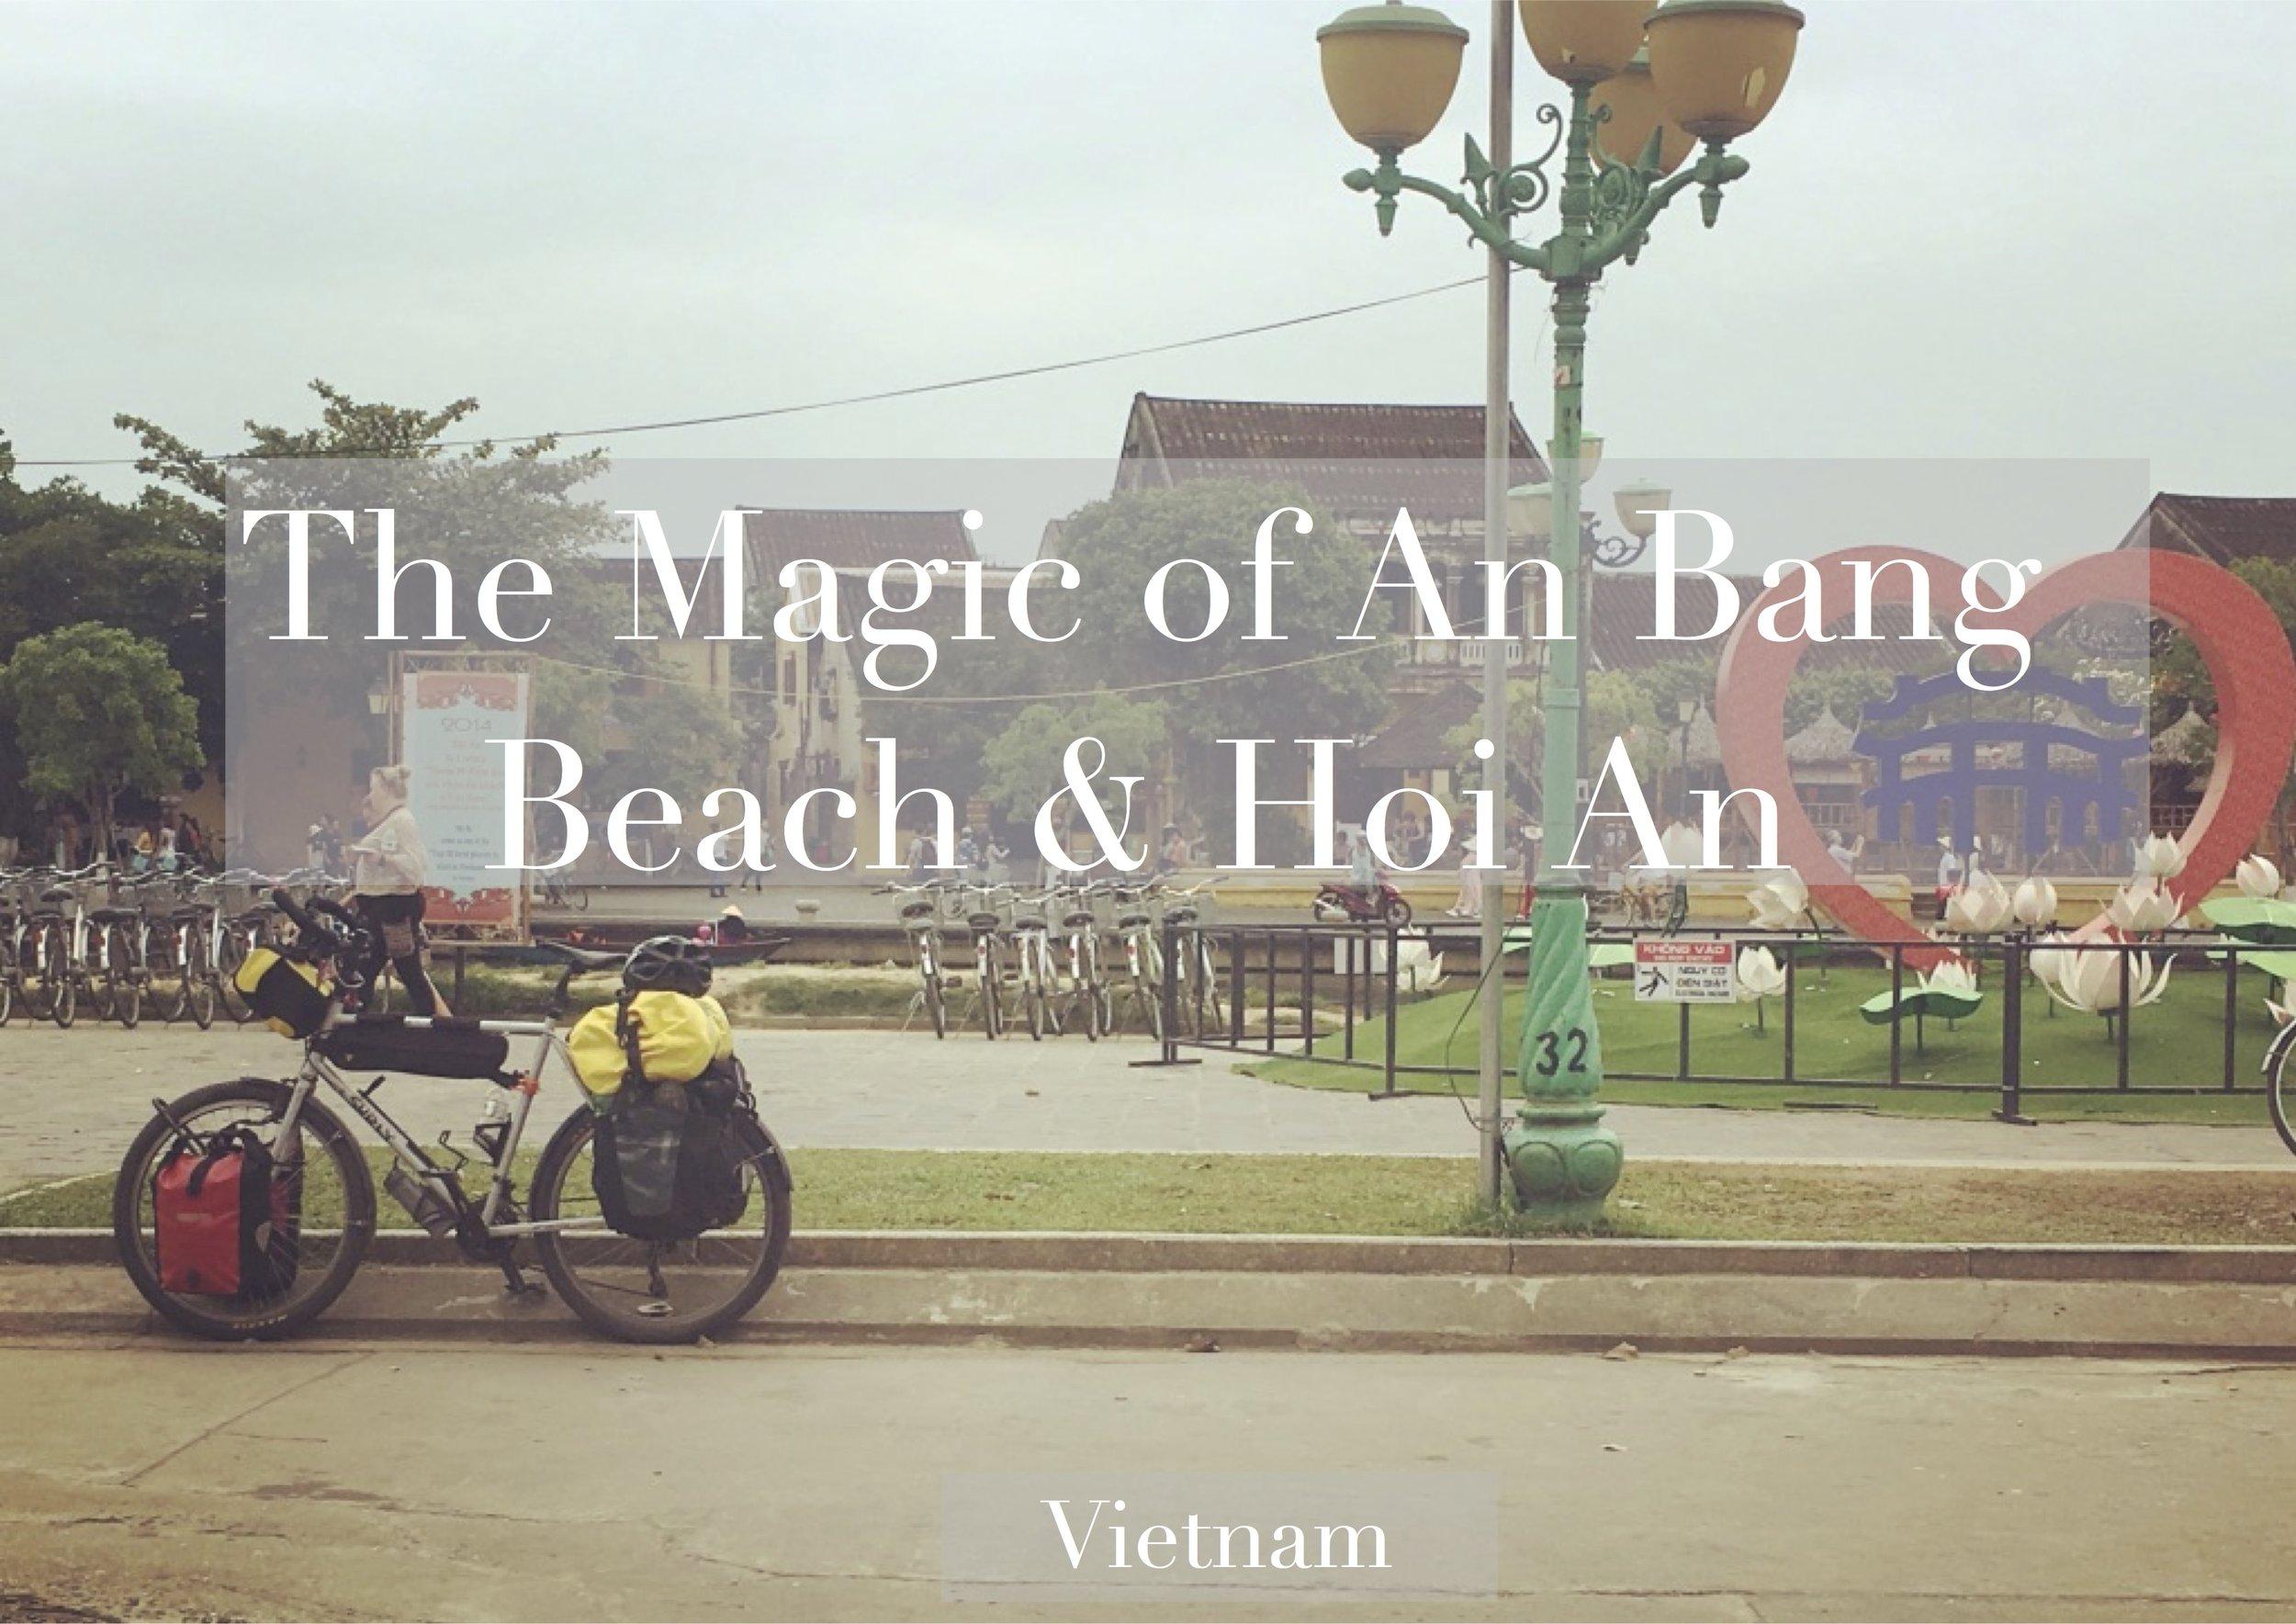 The magic of An Bang and Hoi An.jpg